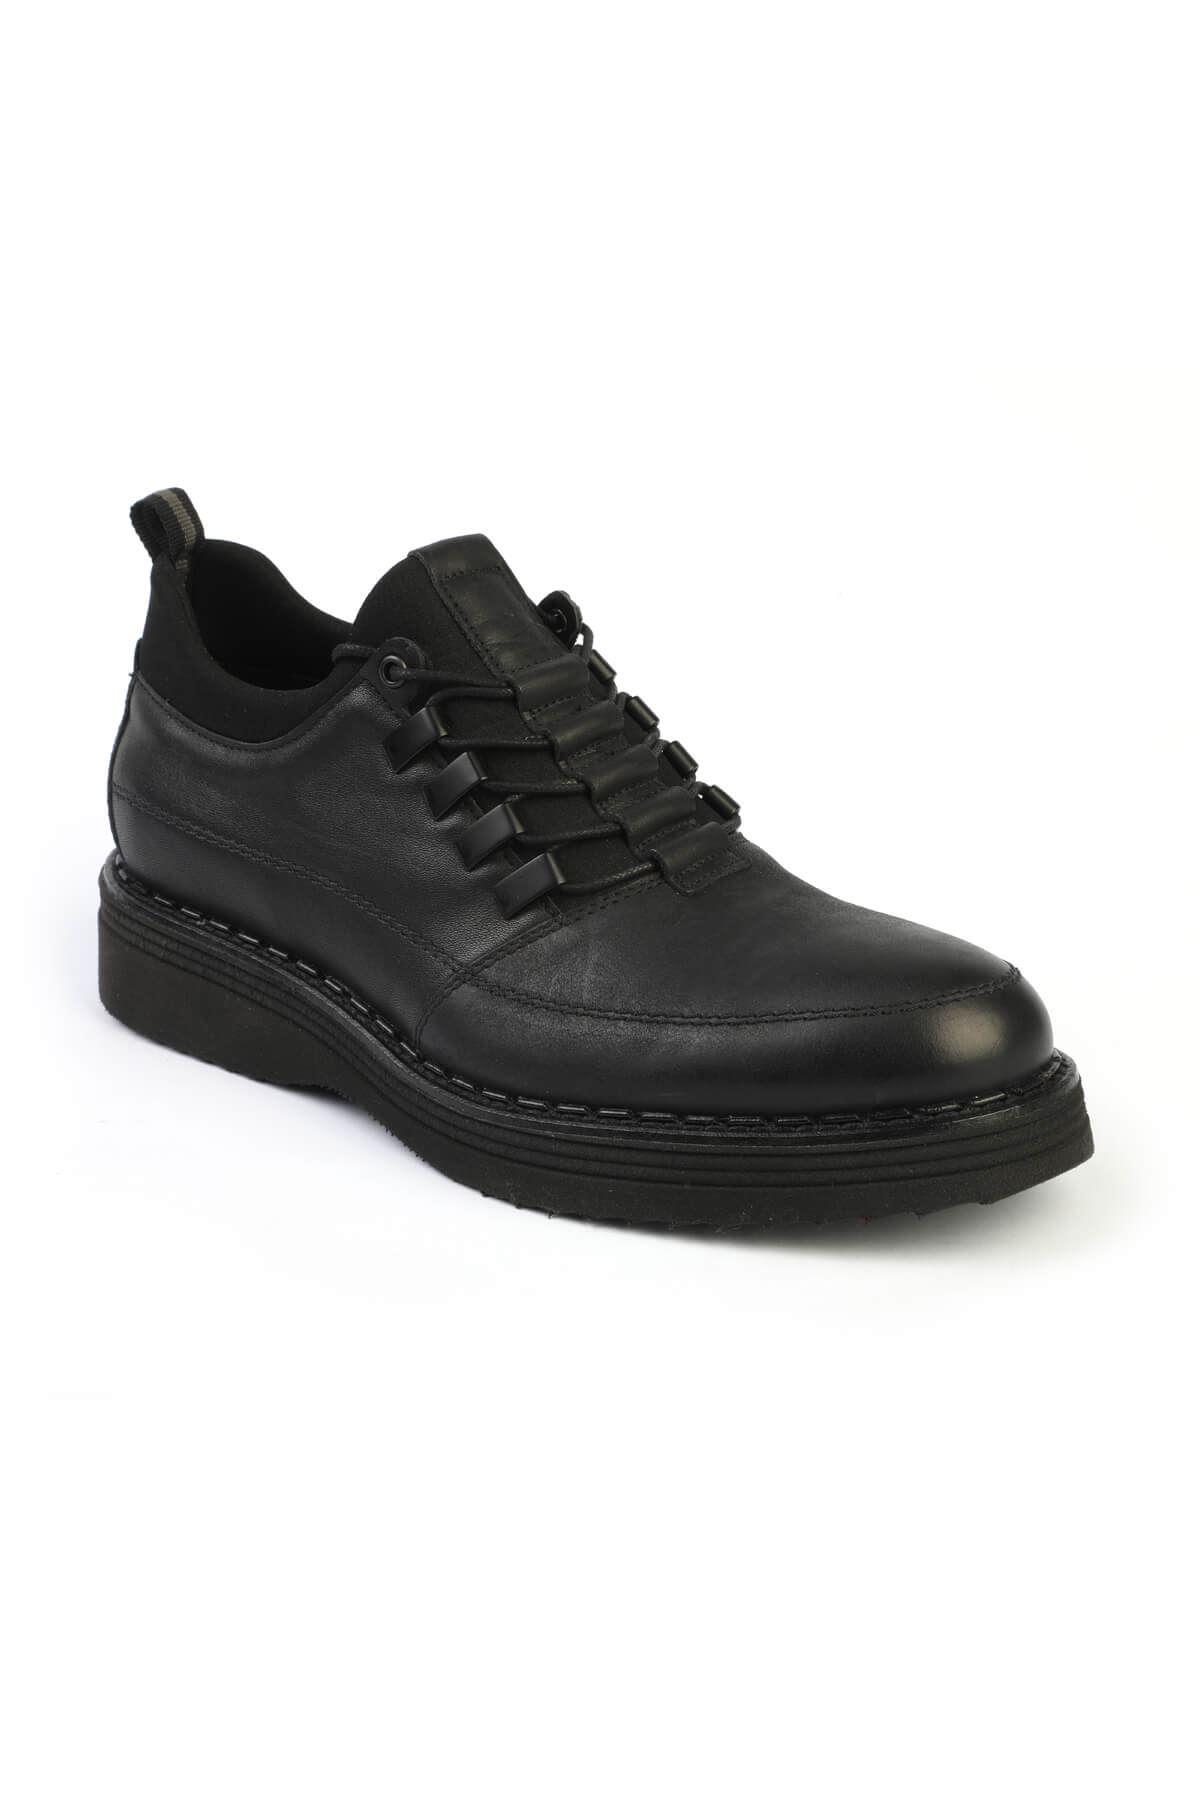 Libero 2903 Black Casual Shoes